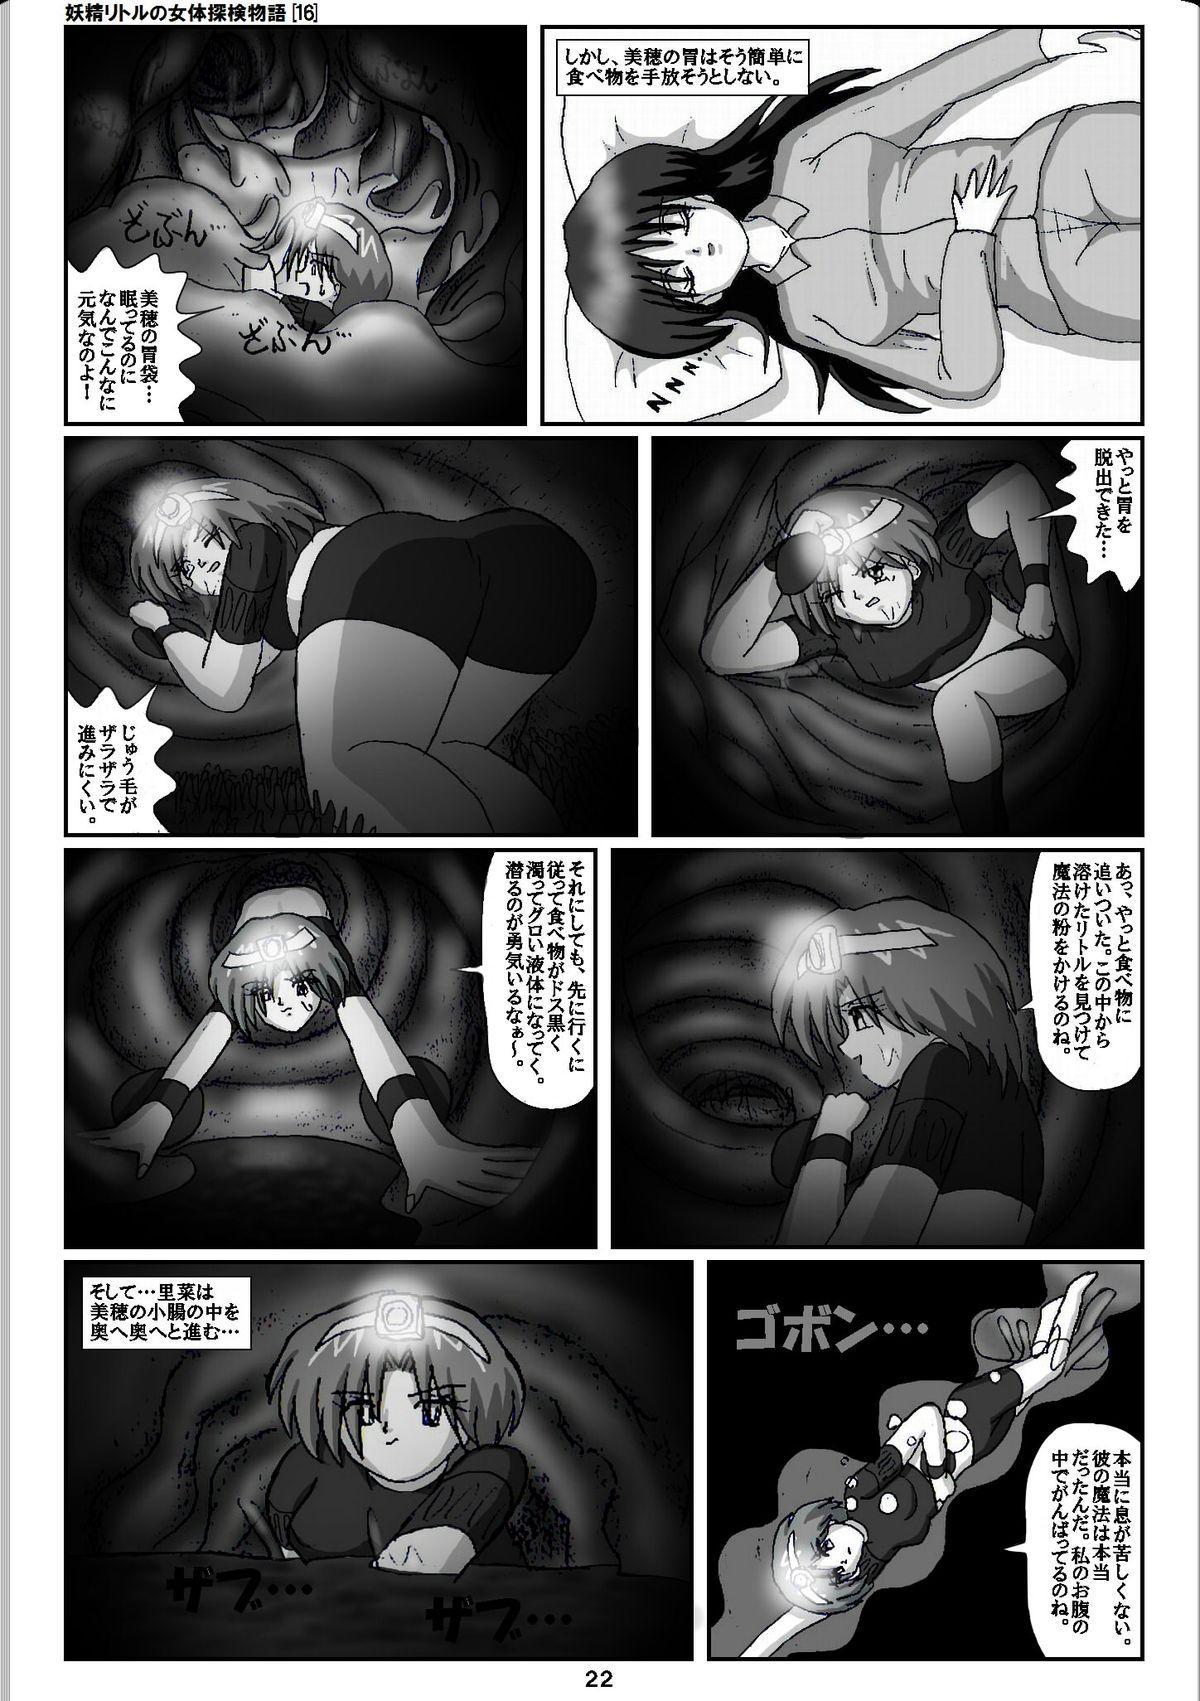 Yousei Little no Nyotai Tanken Monogatari 21